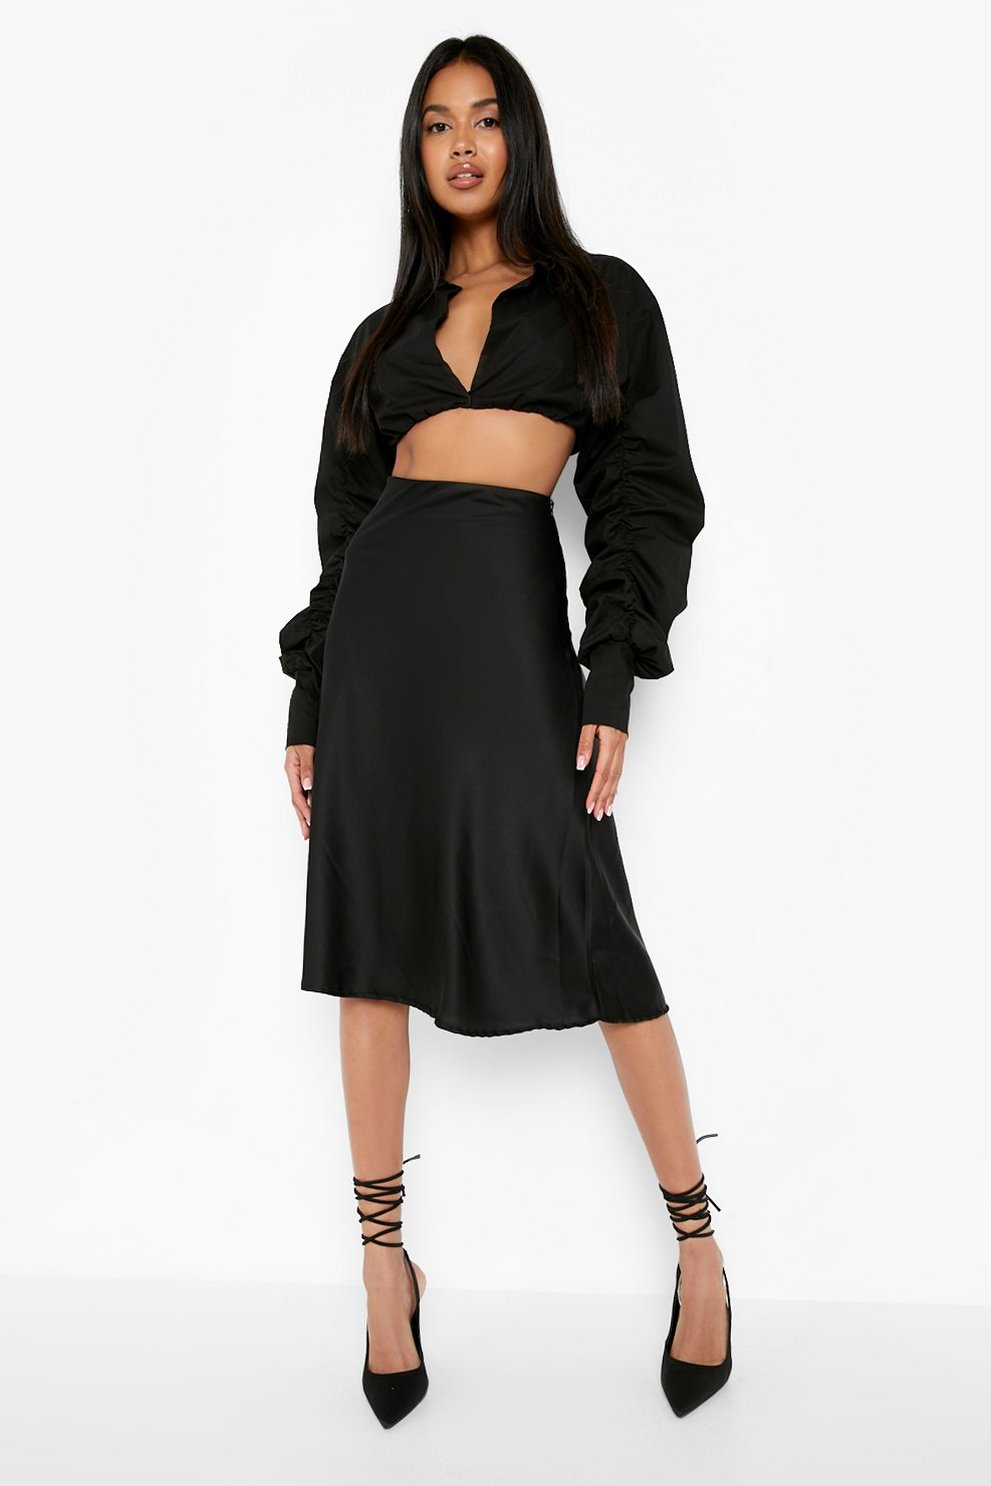 c30d98e6ab4 Satin Bias Cut Slip Midi Skirt